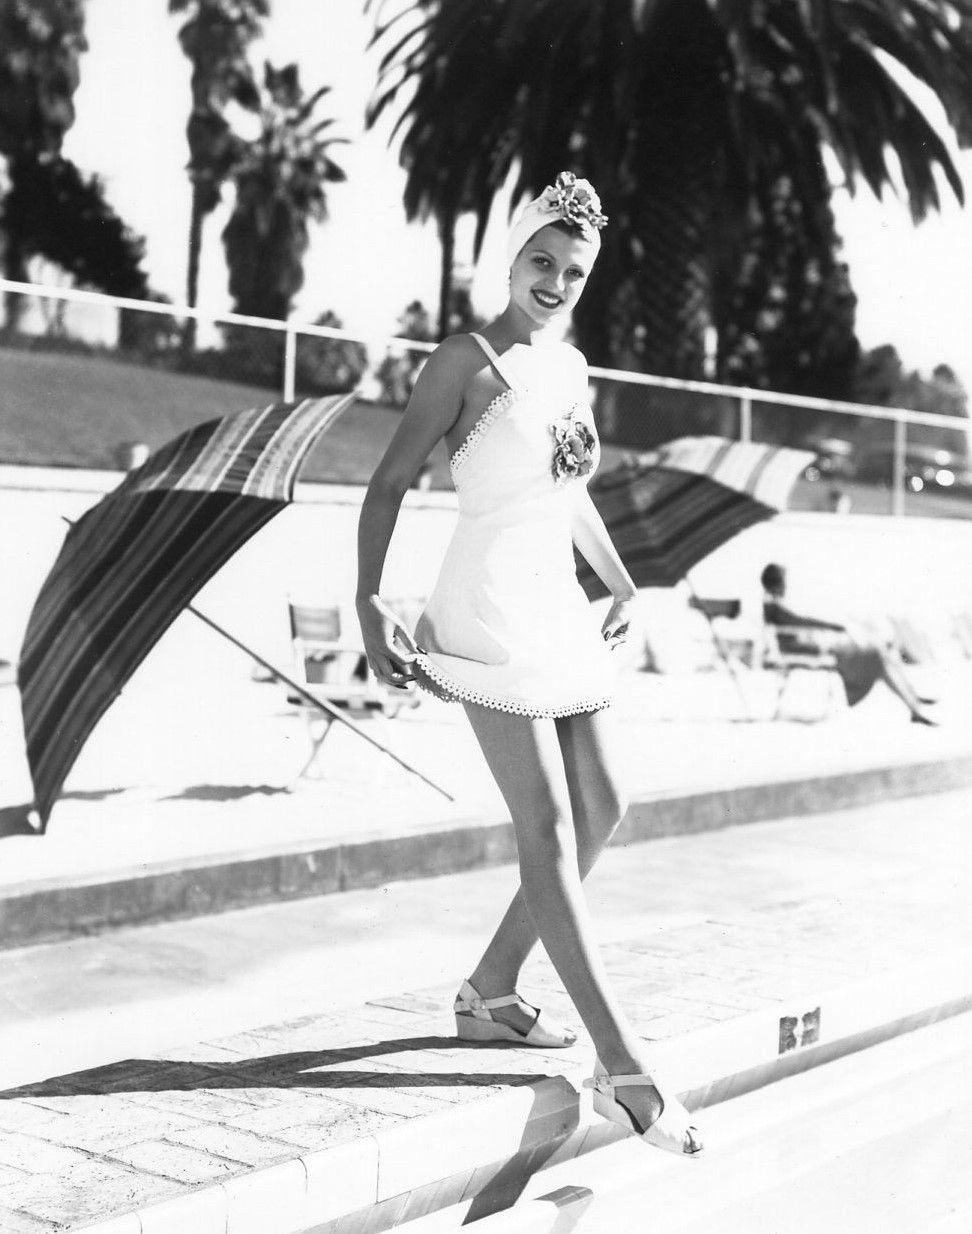 Rita Hayworth in a fabulous swim outfit!